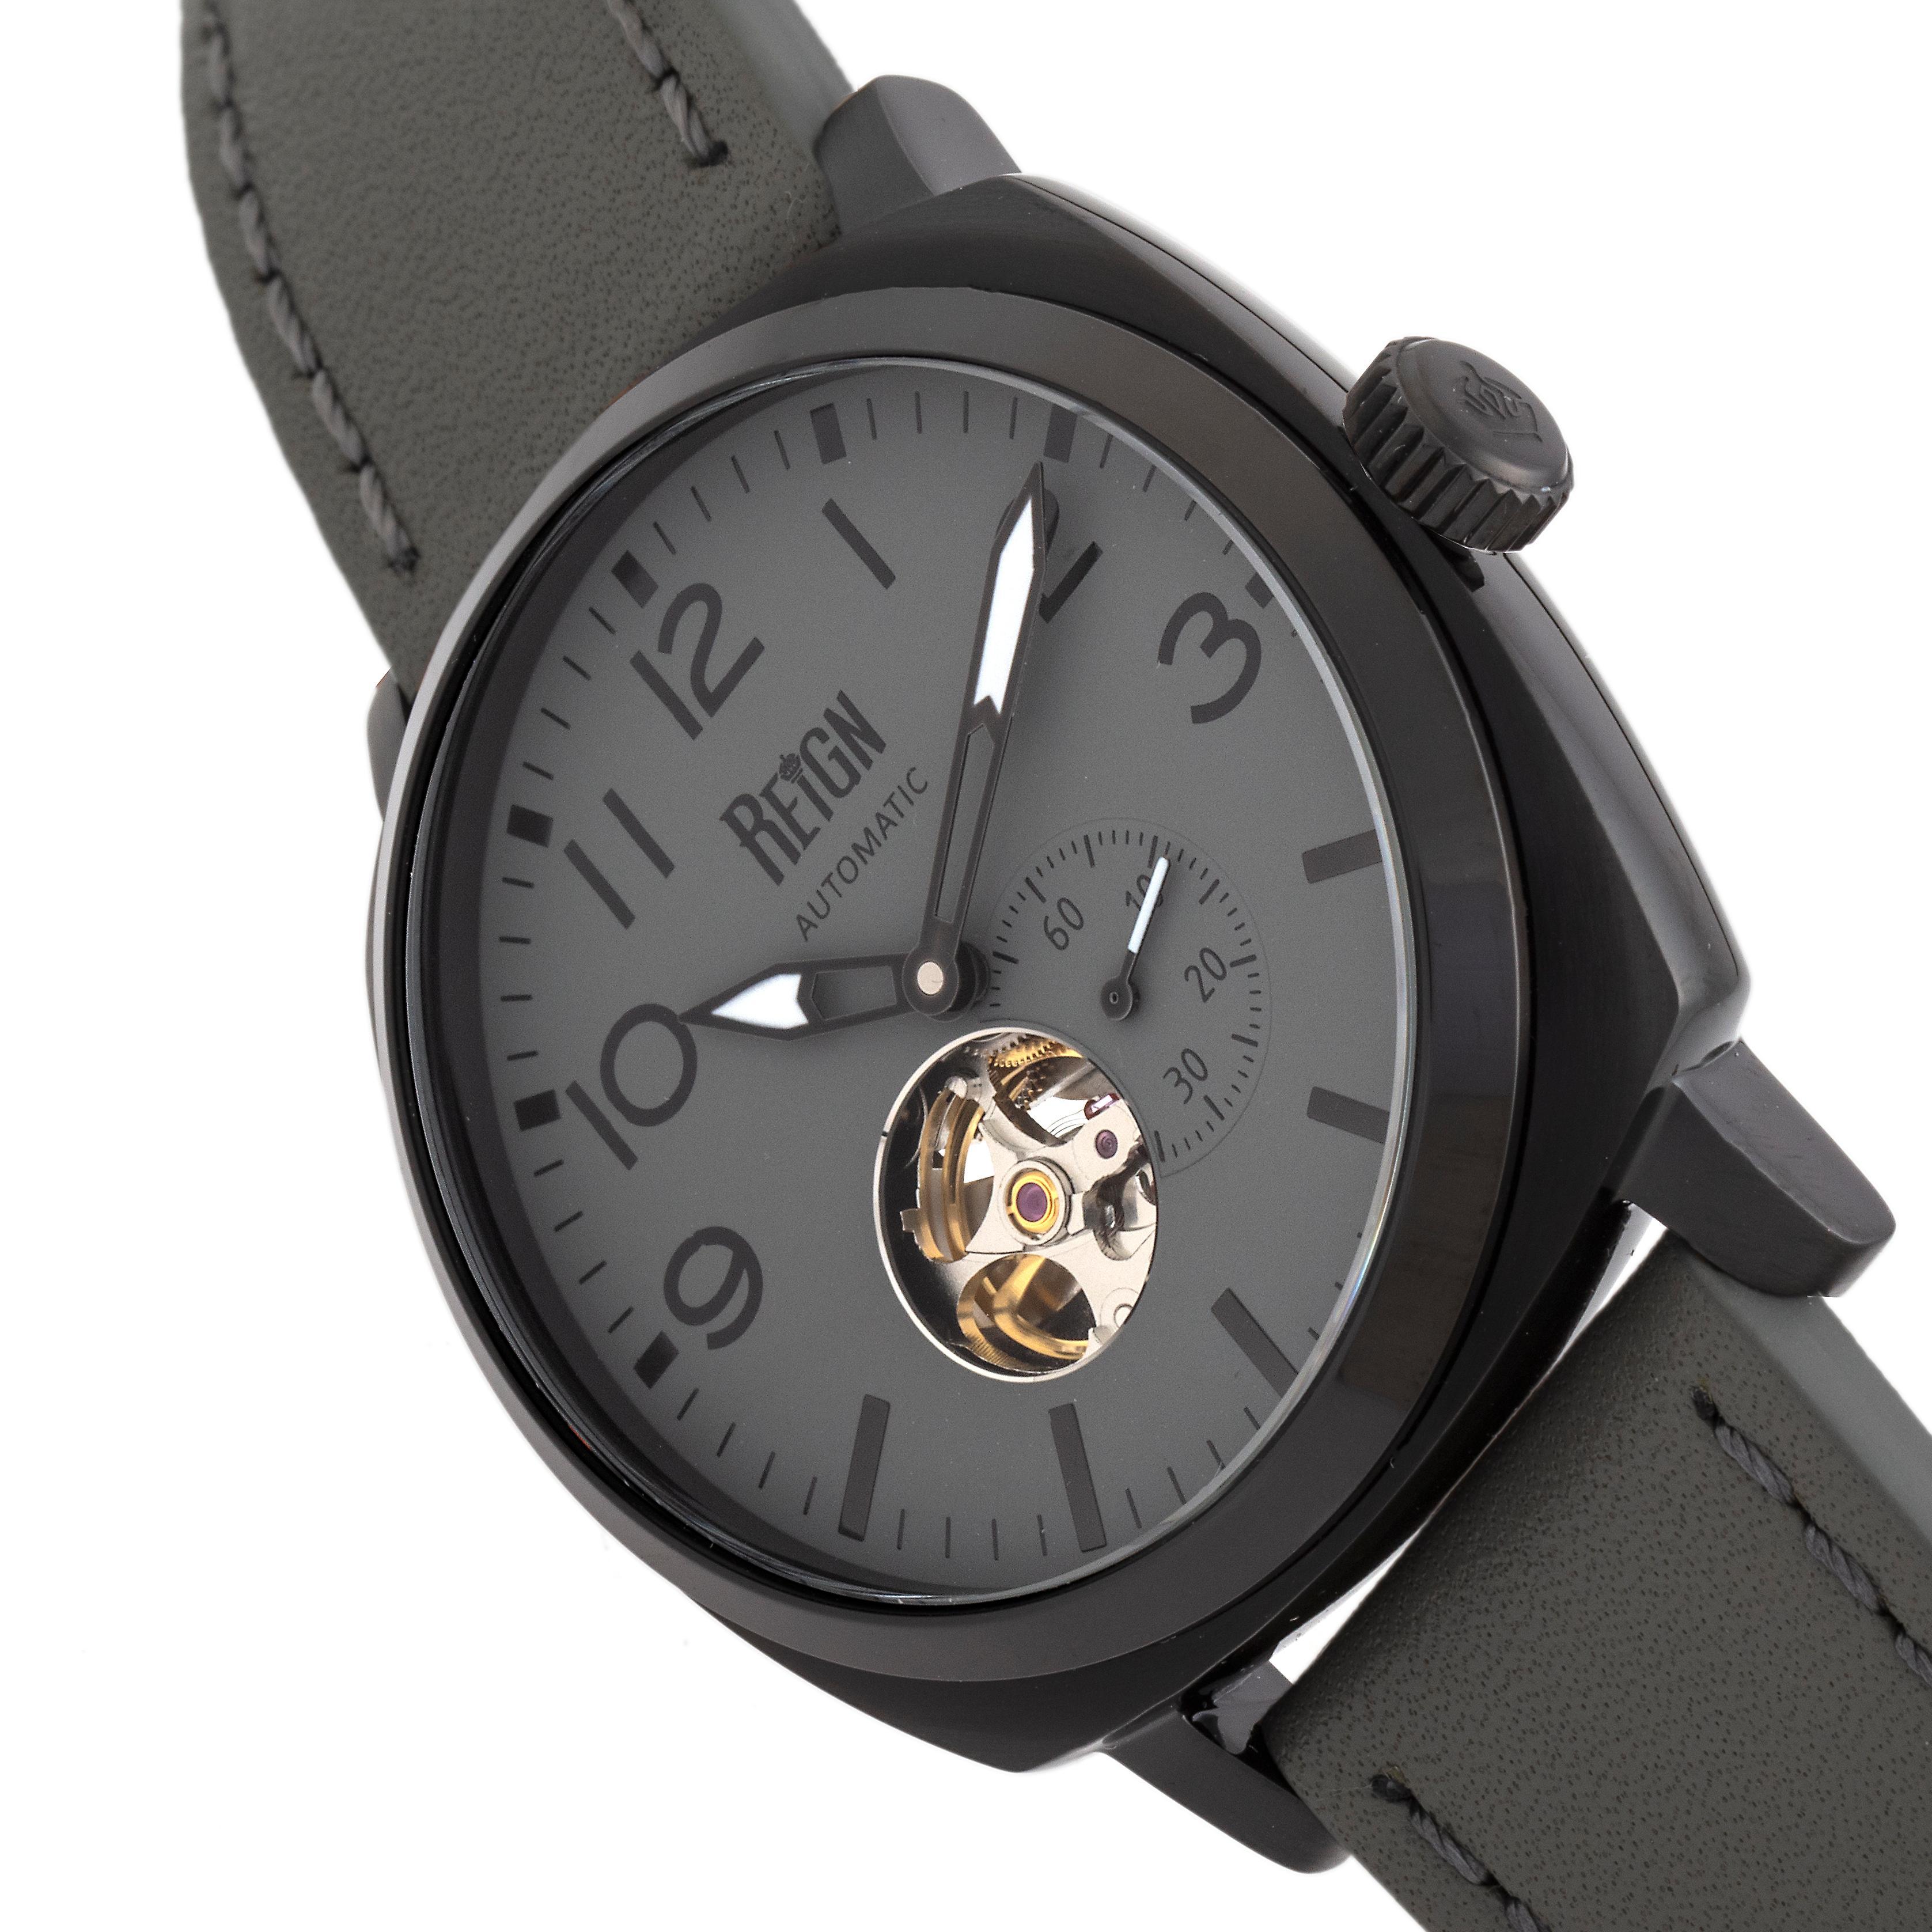 Reign Napoleon Automatic Semi-Skeleton Leather-Band Watch - Black/Grey